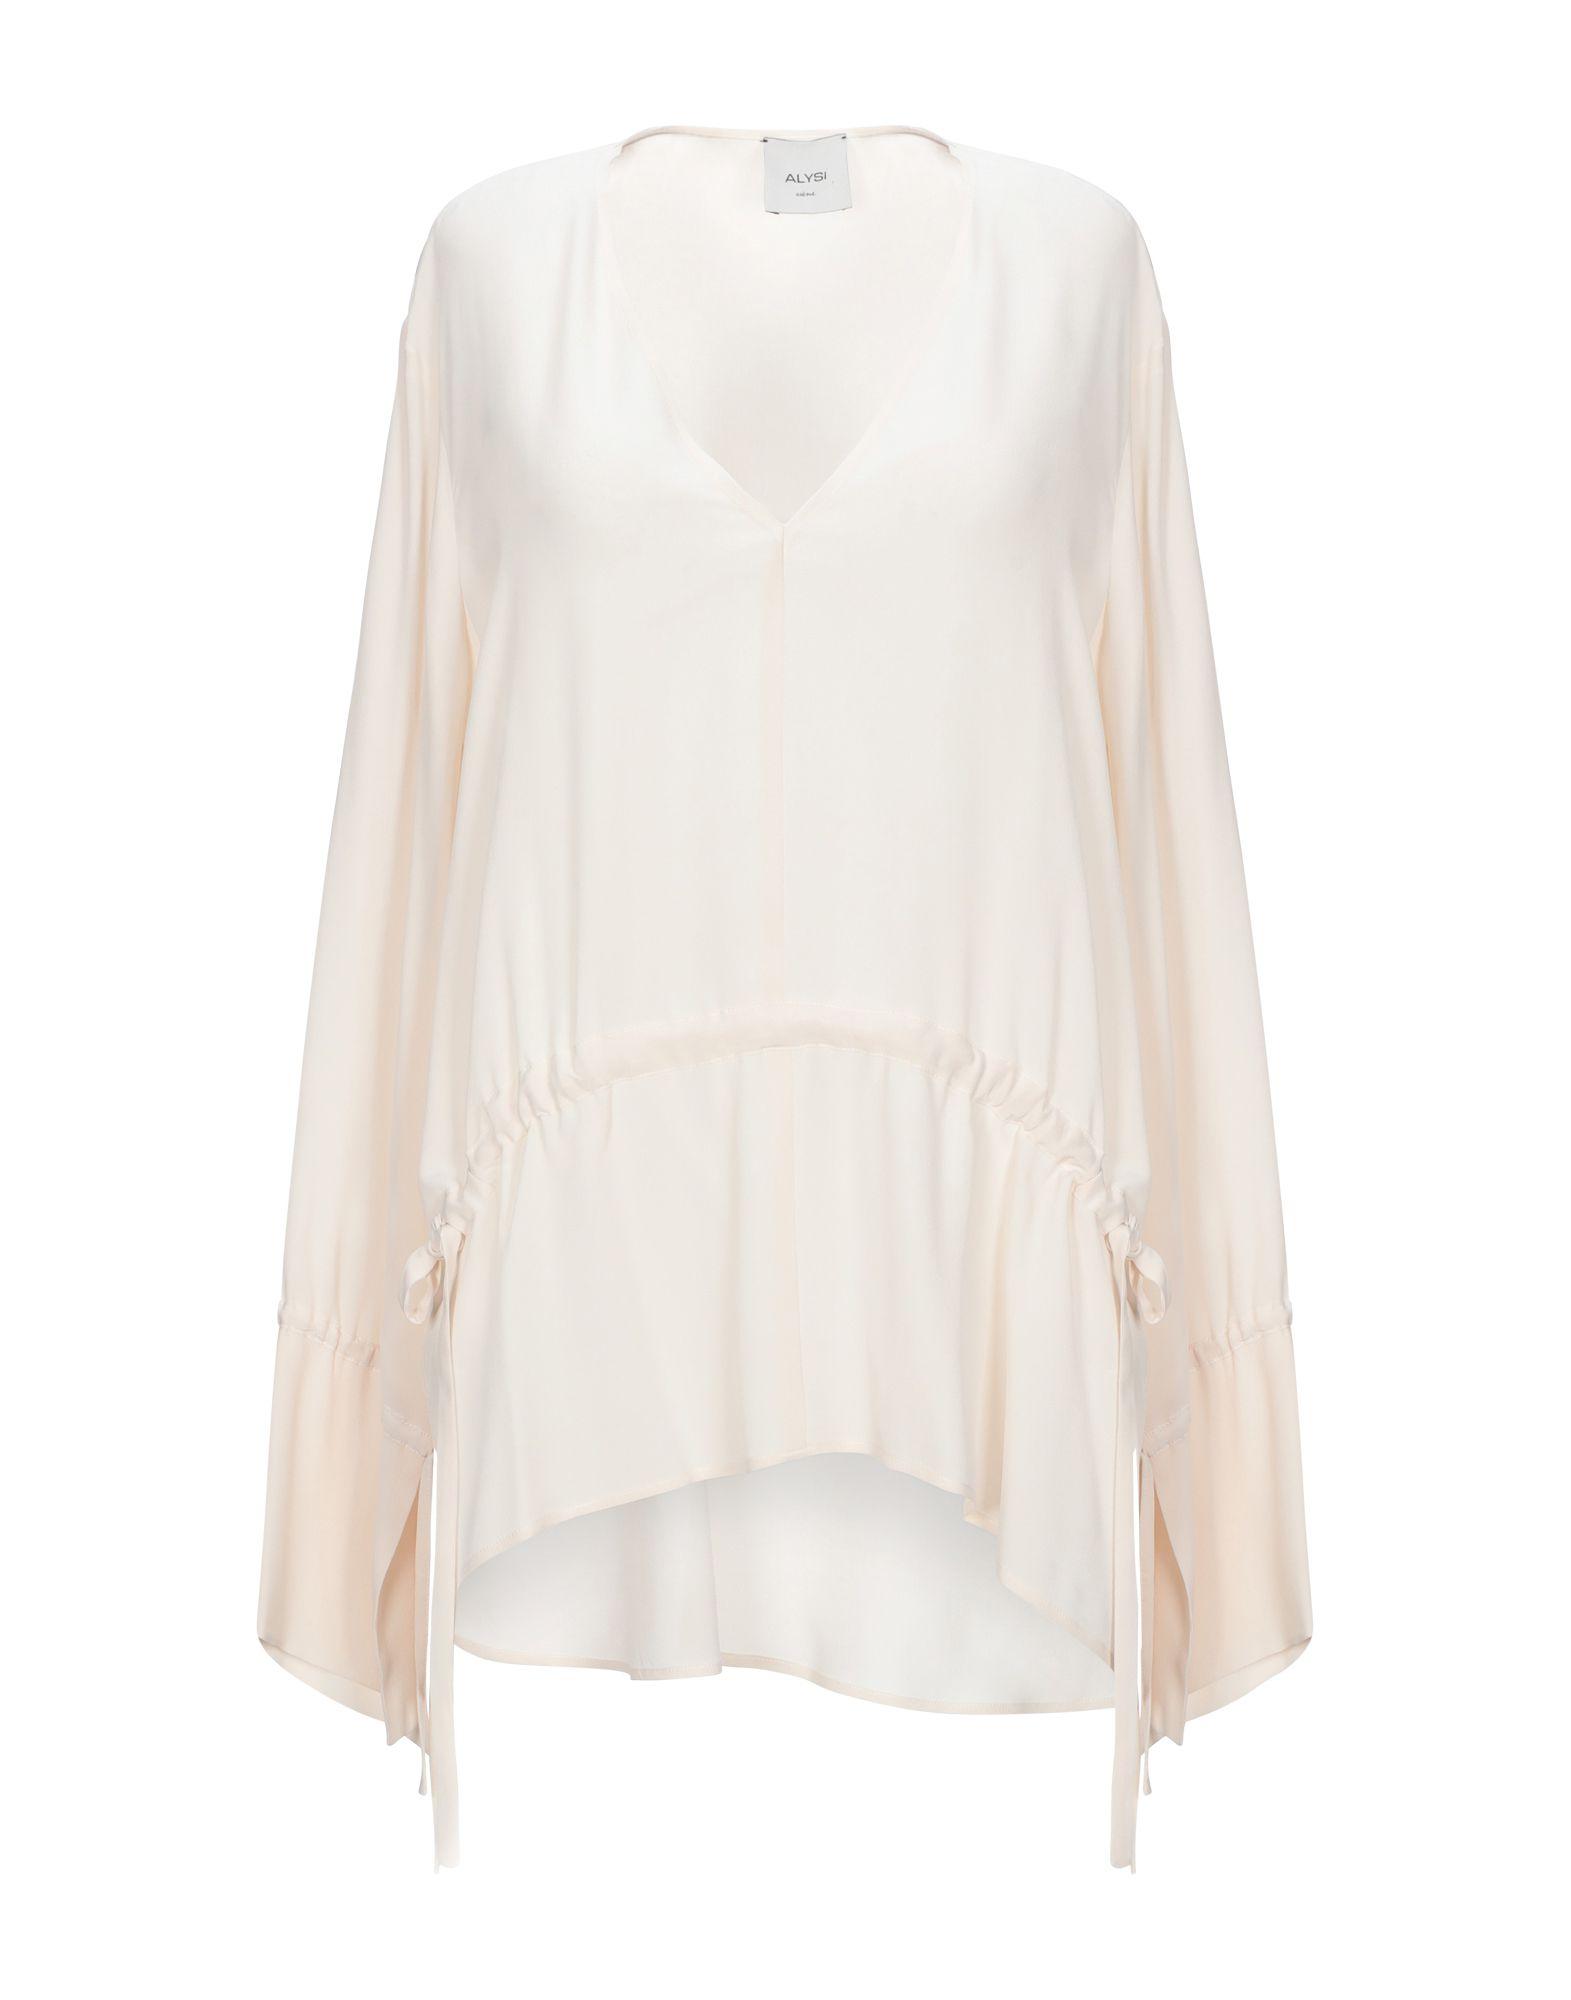 ALYSI Блузка блузка quelle linea tesini by heine 6300